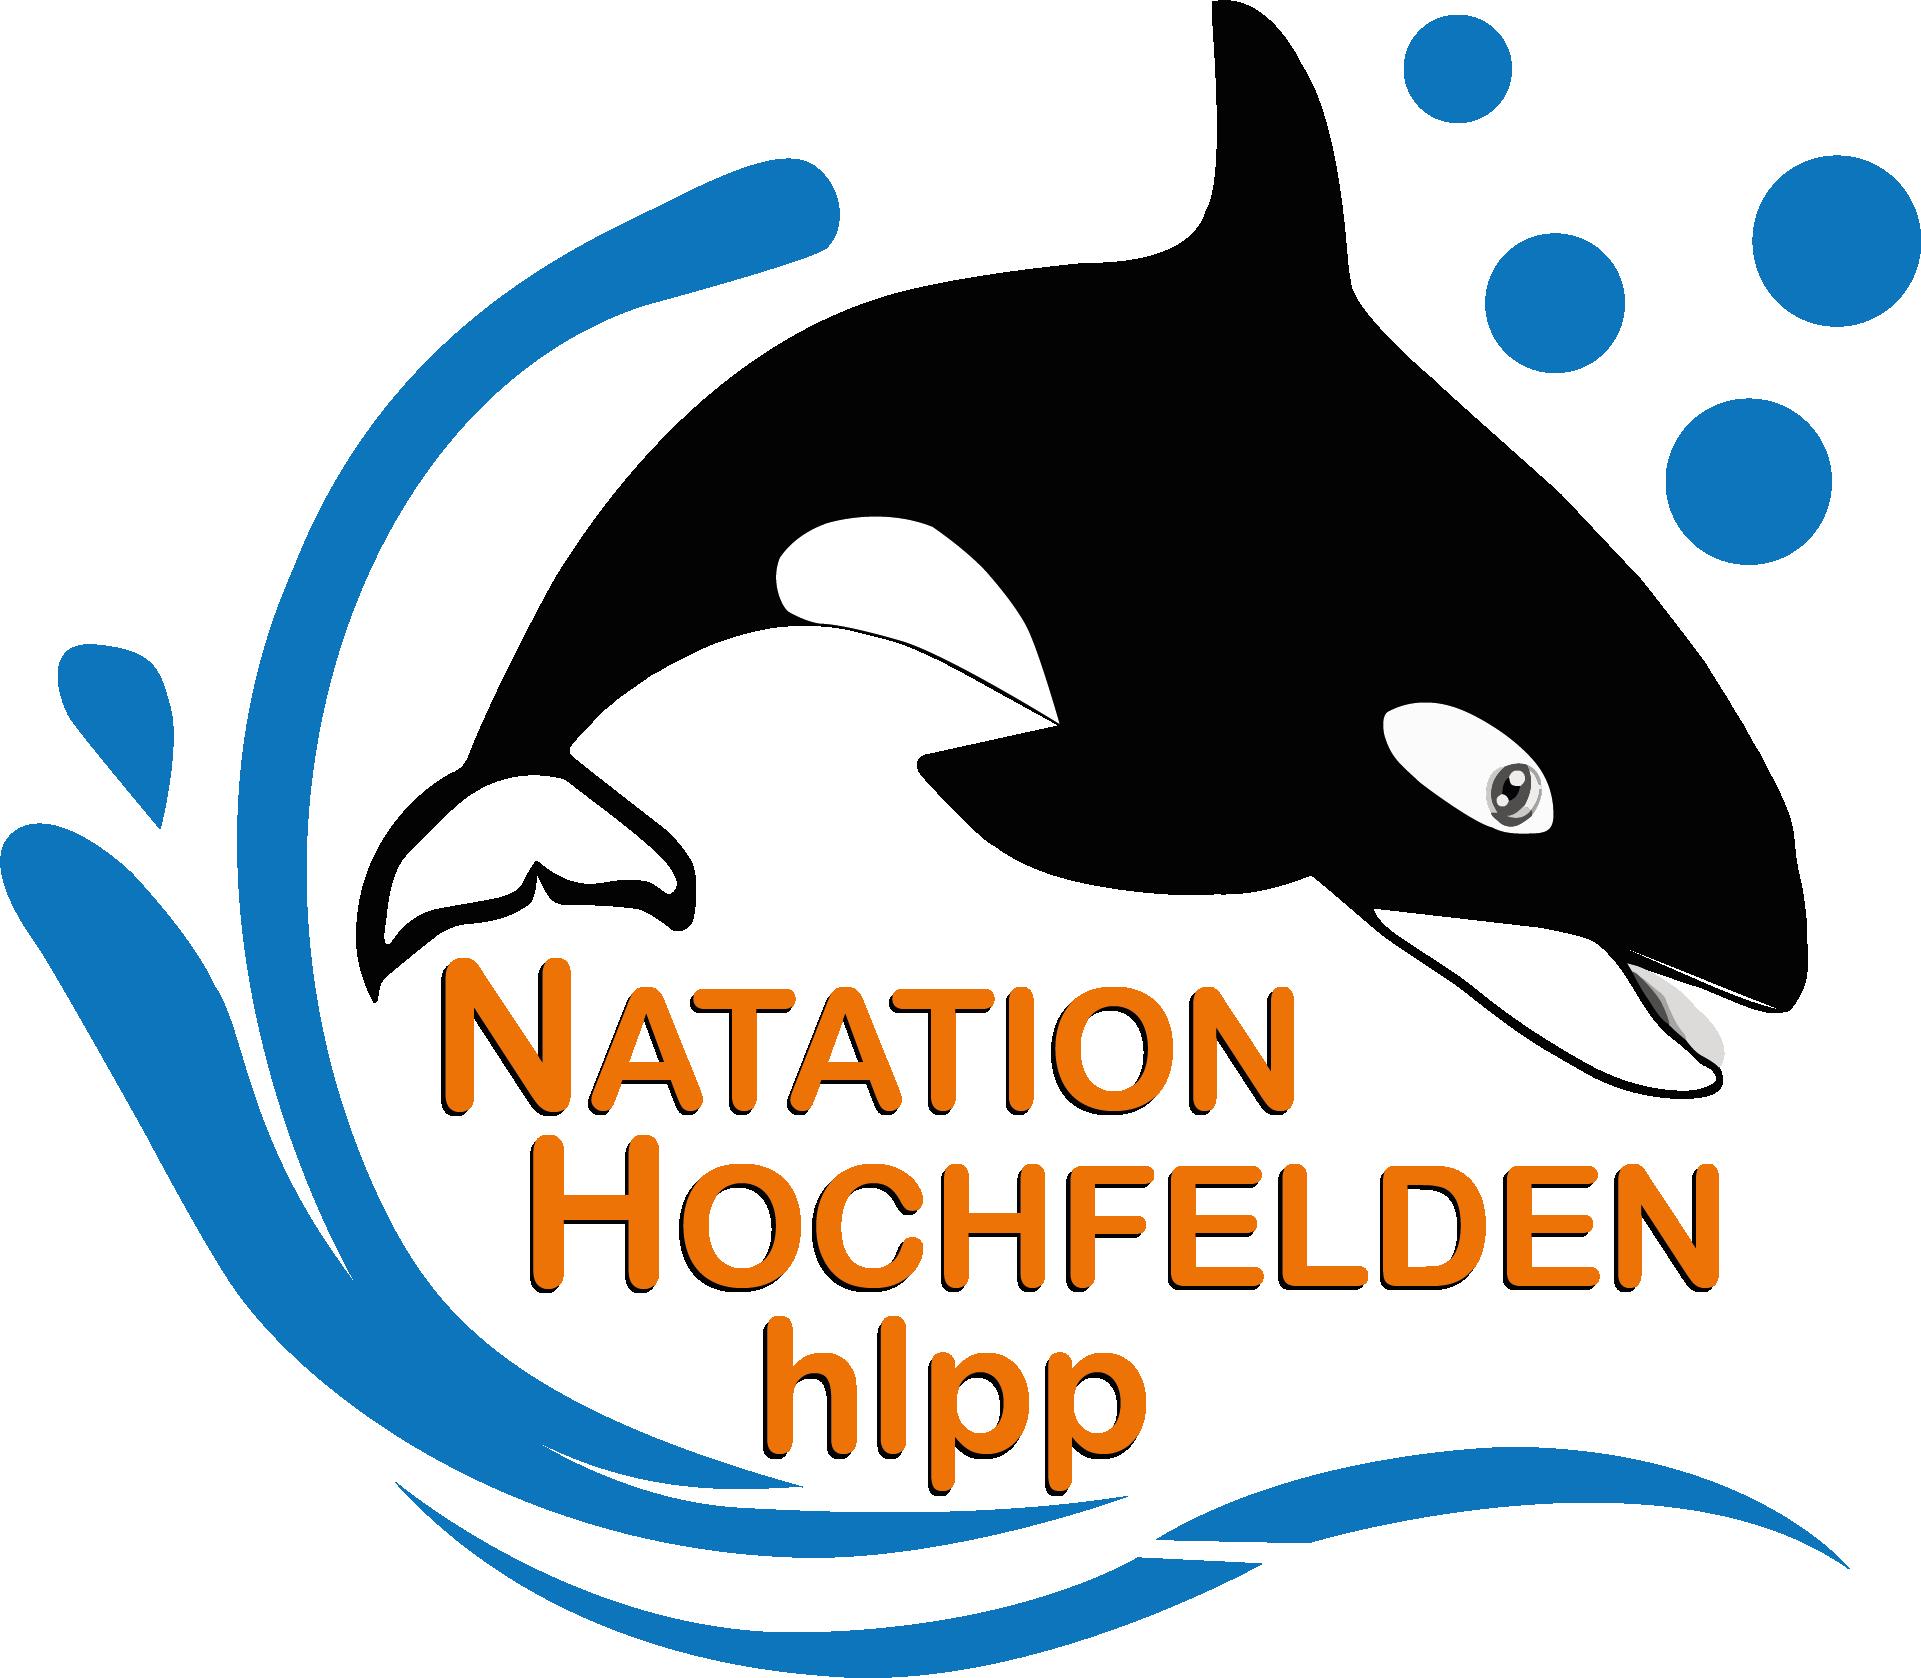 Natation Hochfelden